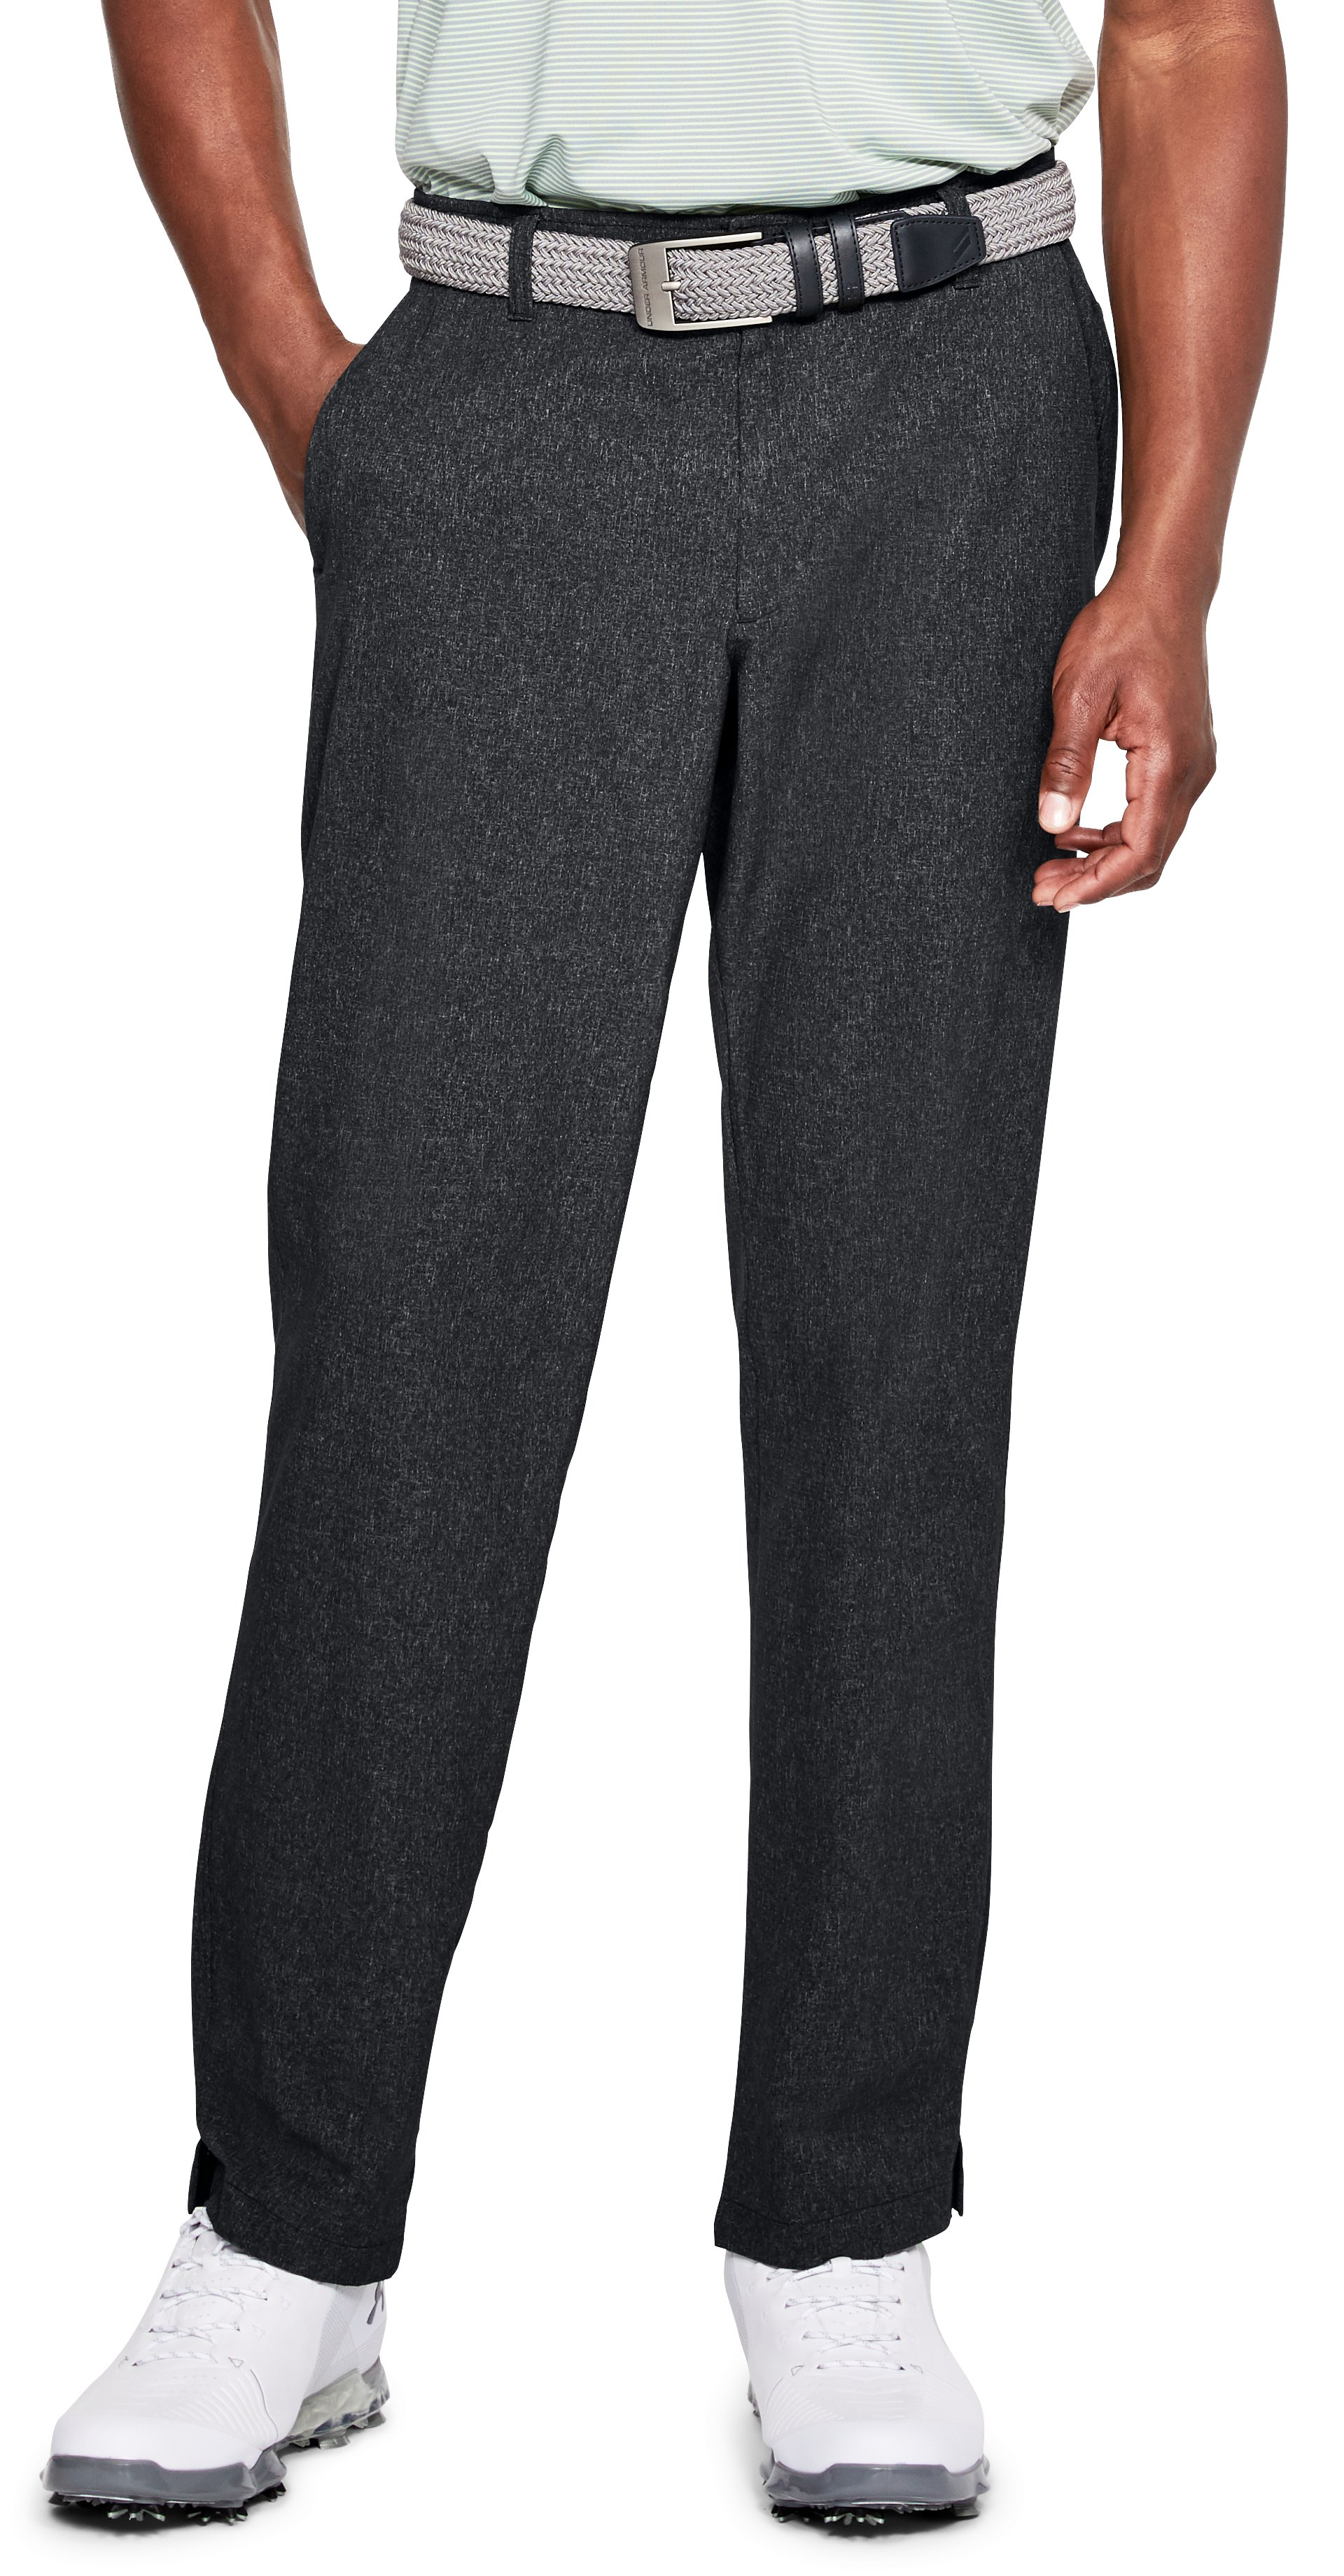 Mens Knitted Denim Jogpants Sports Trousers Urban Classic